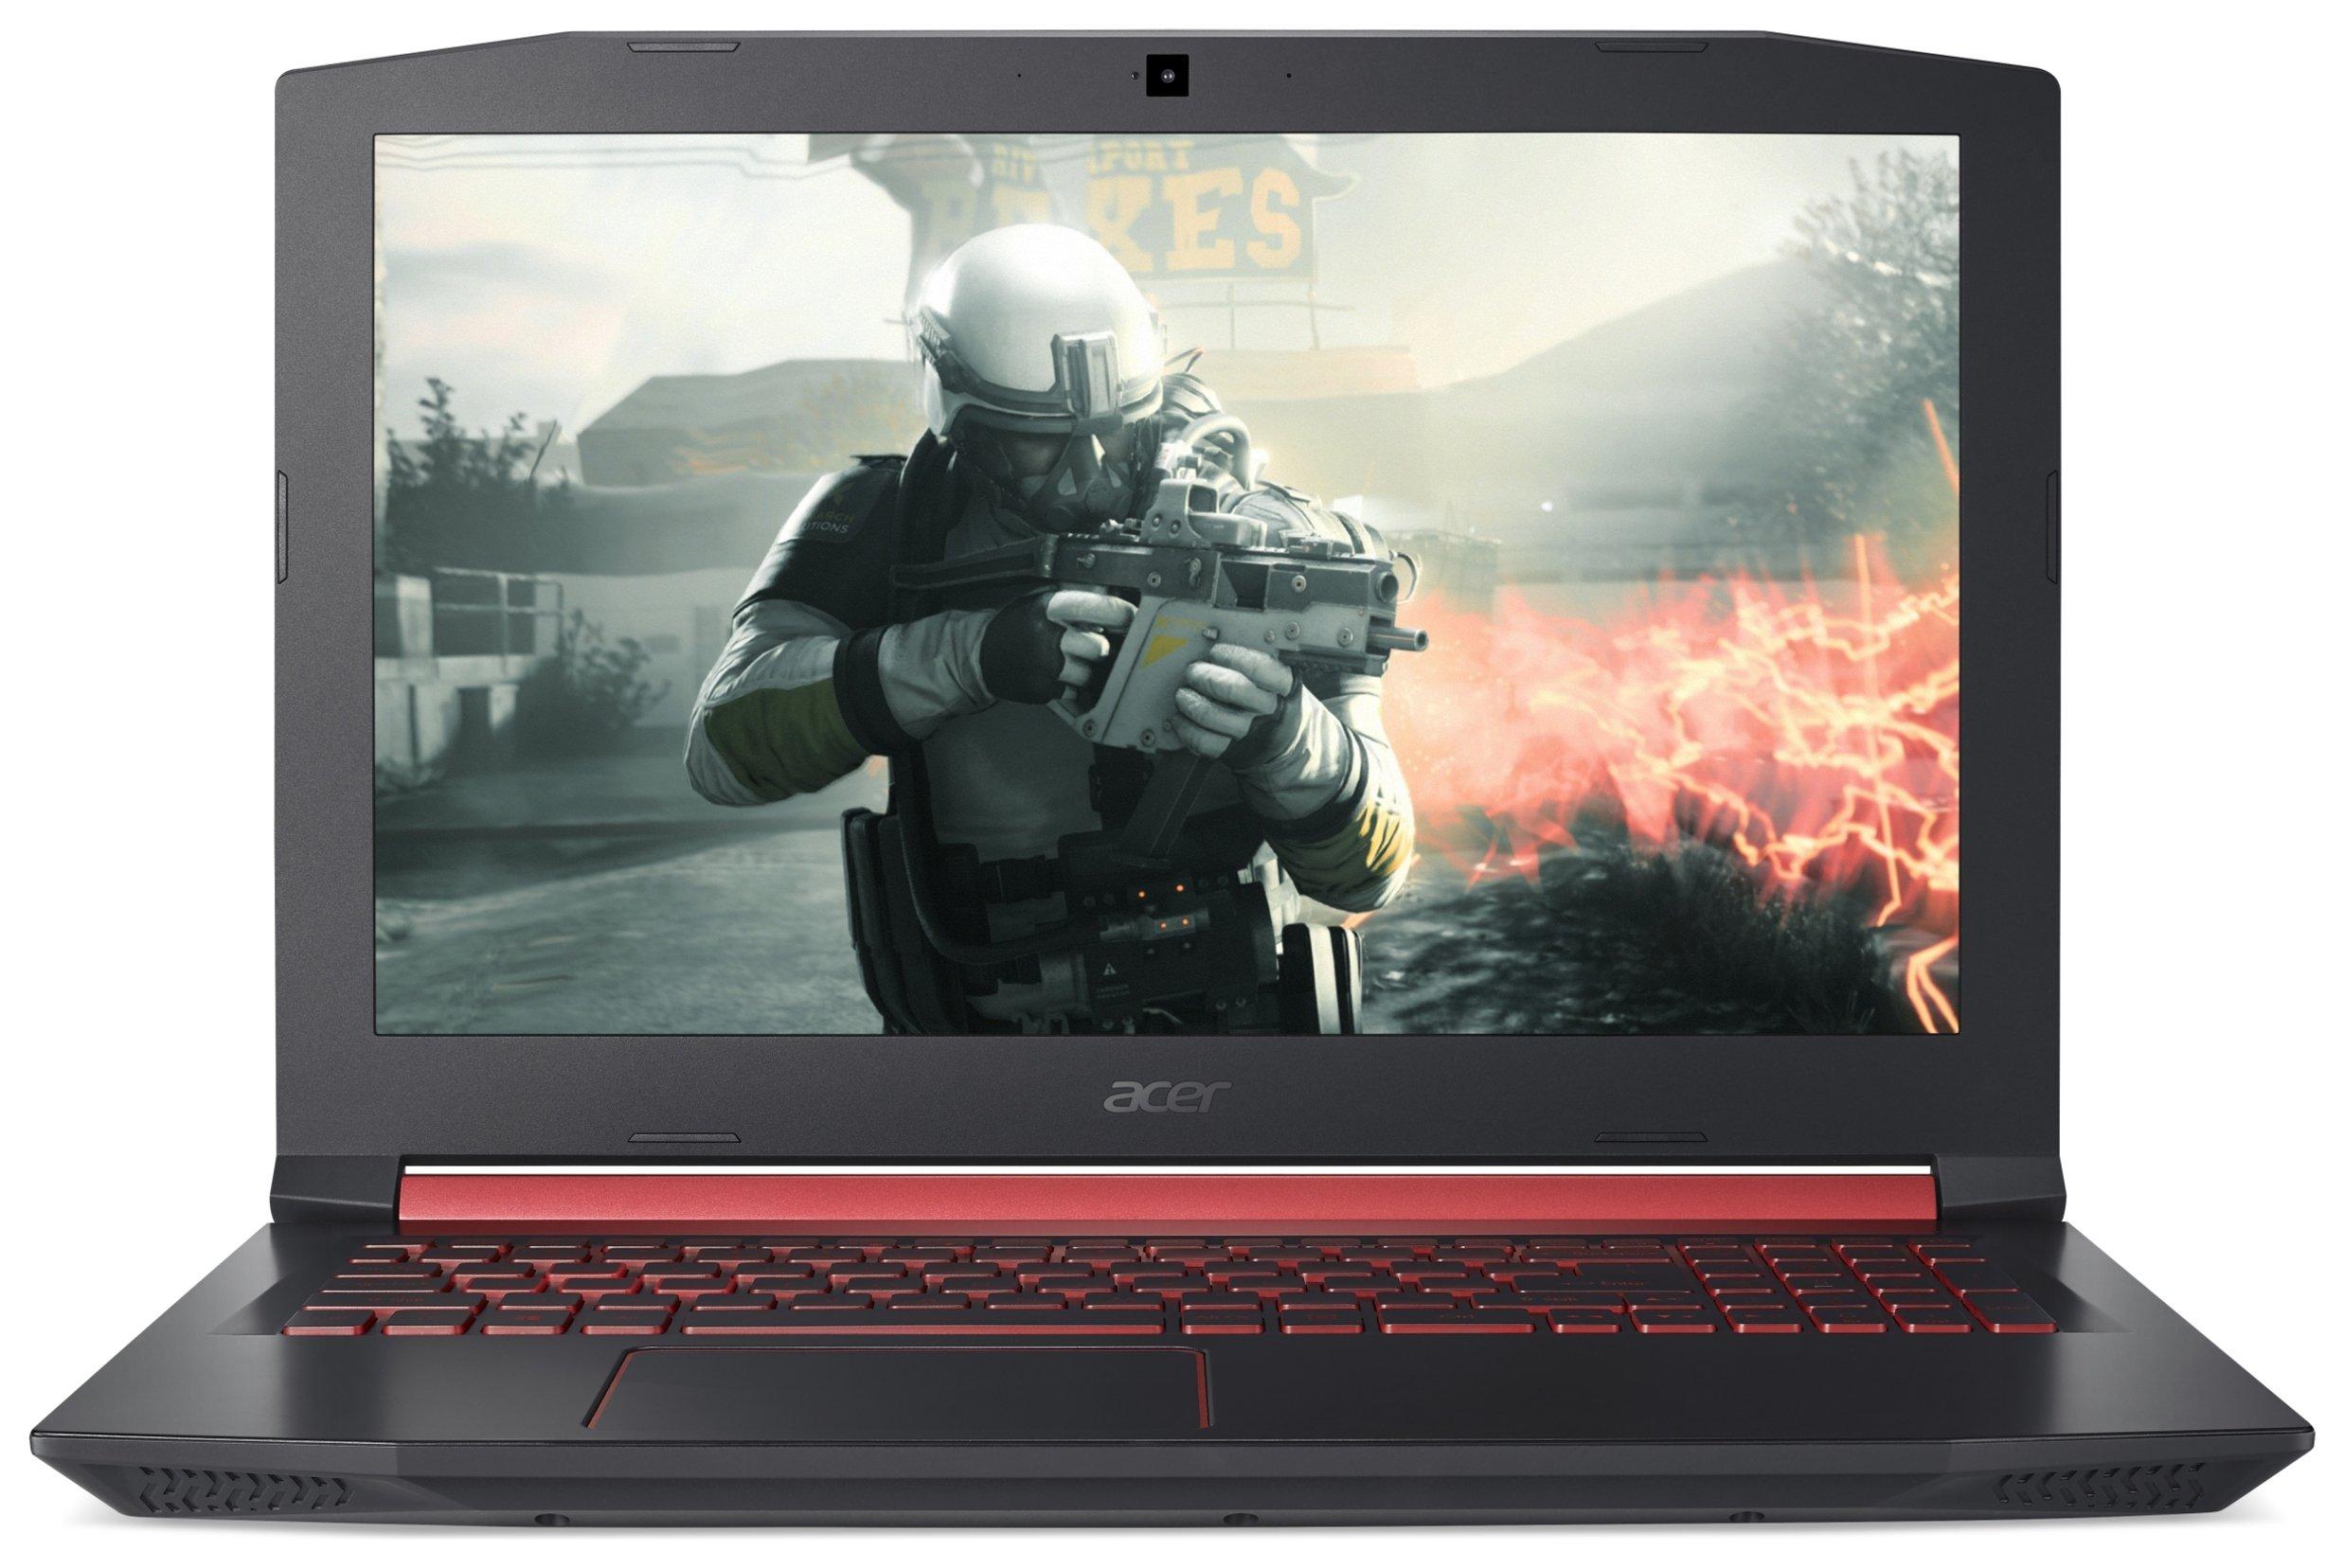 Image of Acer Nitro 5 15.6 In FX9830 8GB 128GB 1TB RX550 Laptop